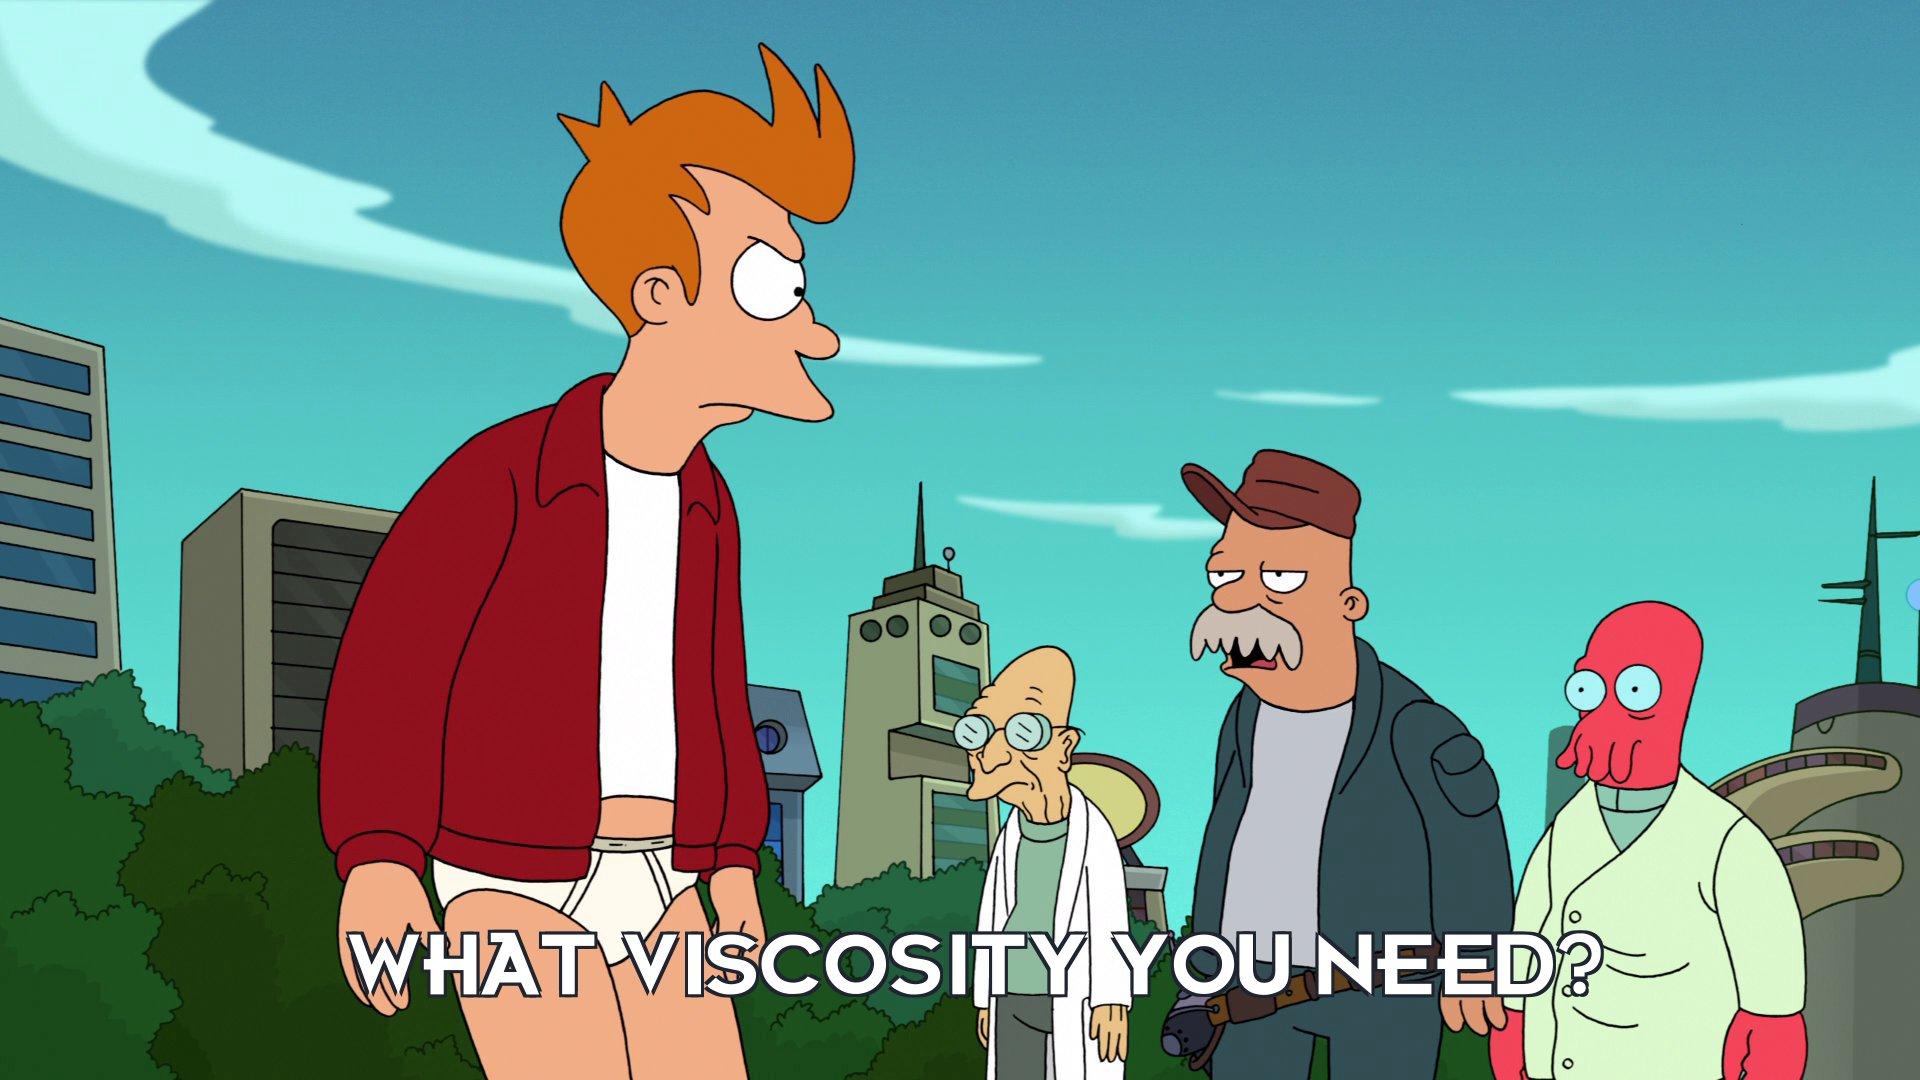 Scruffy: What viscosity you need?